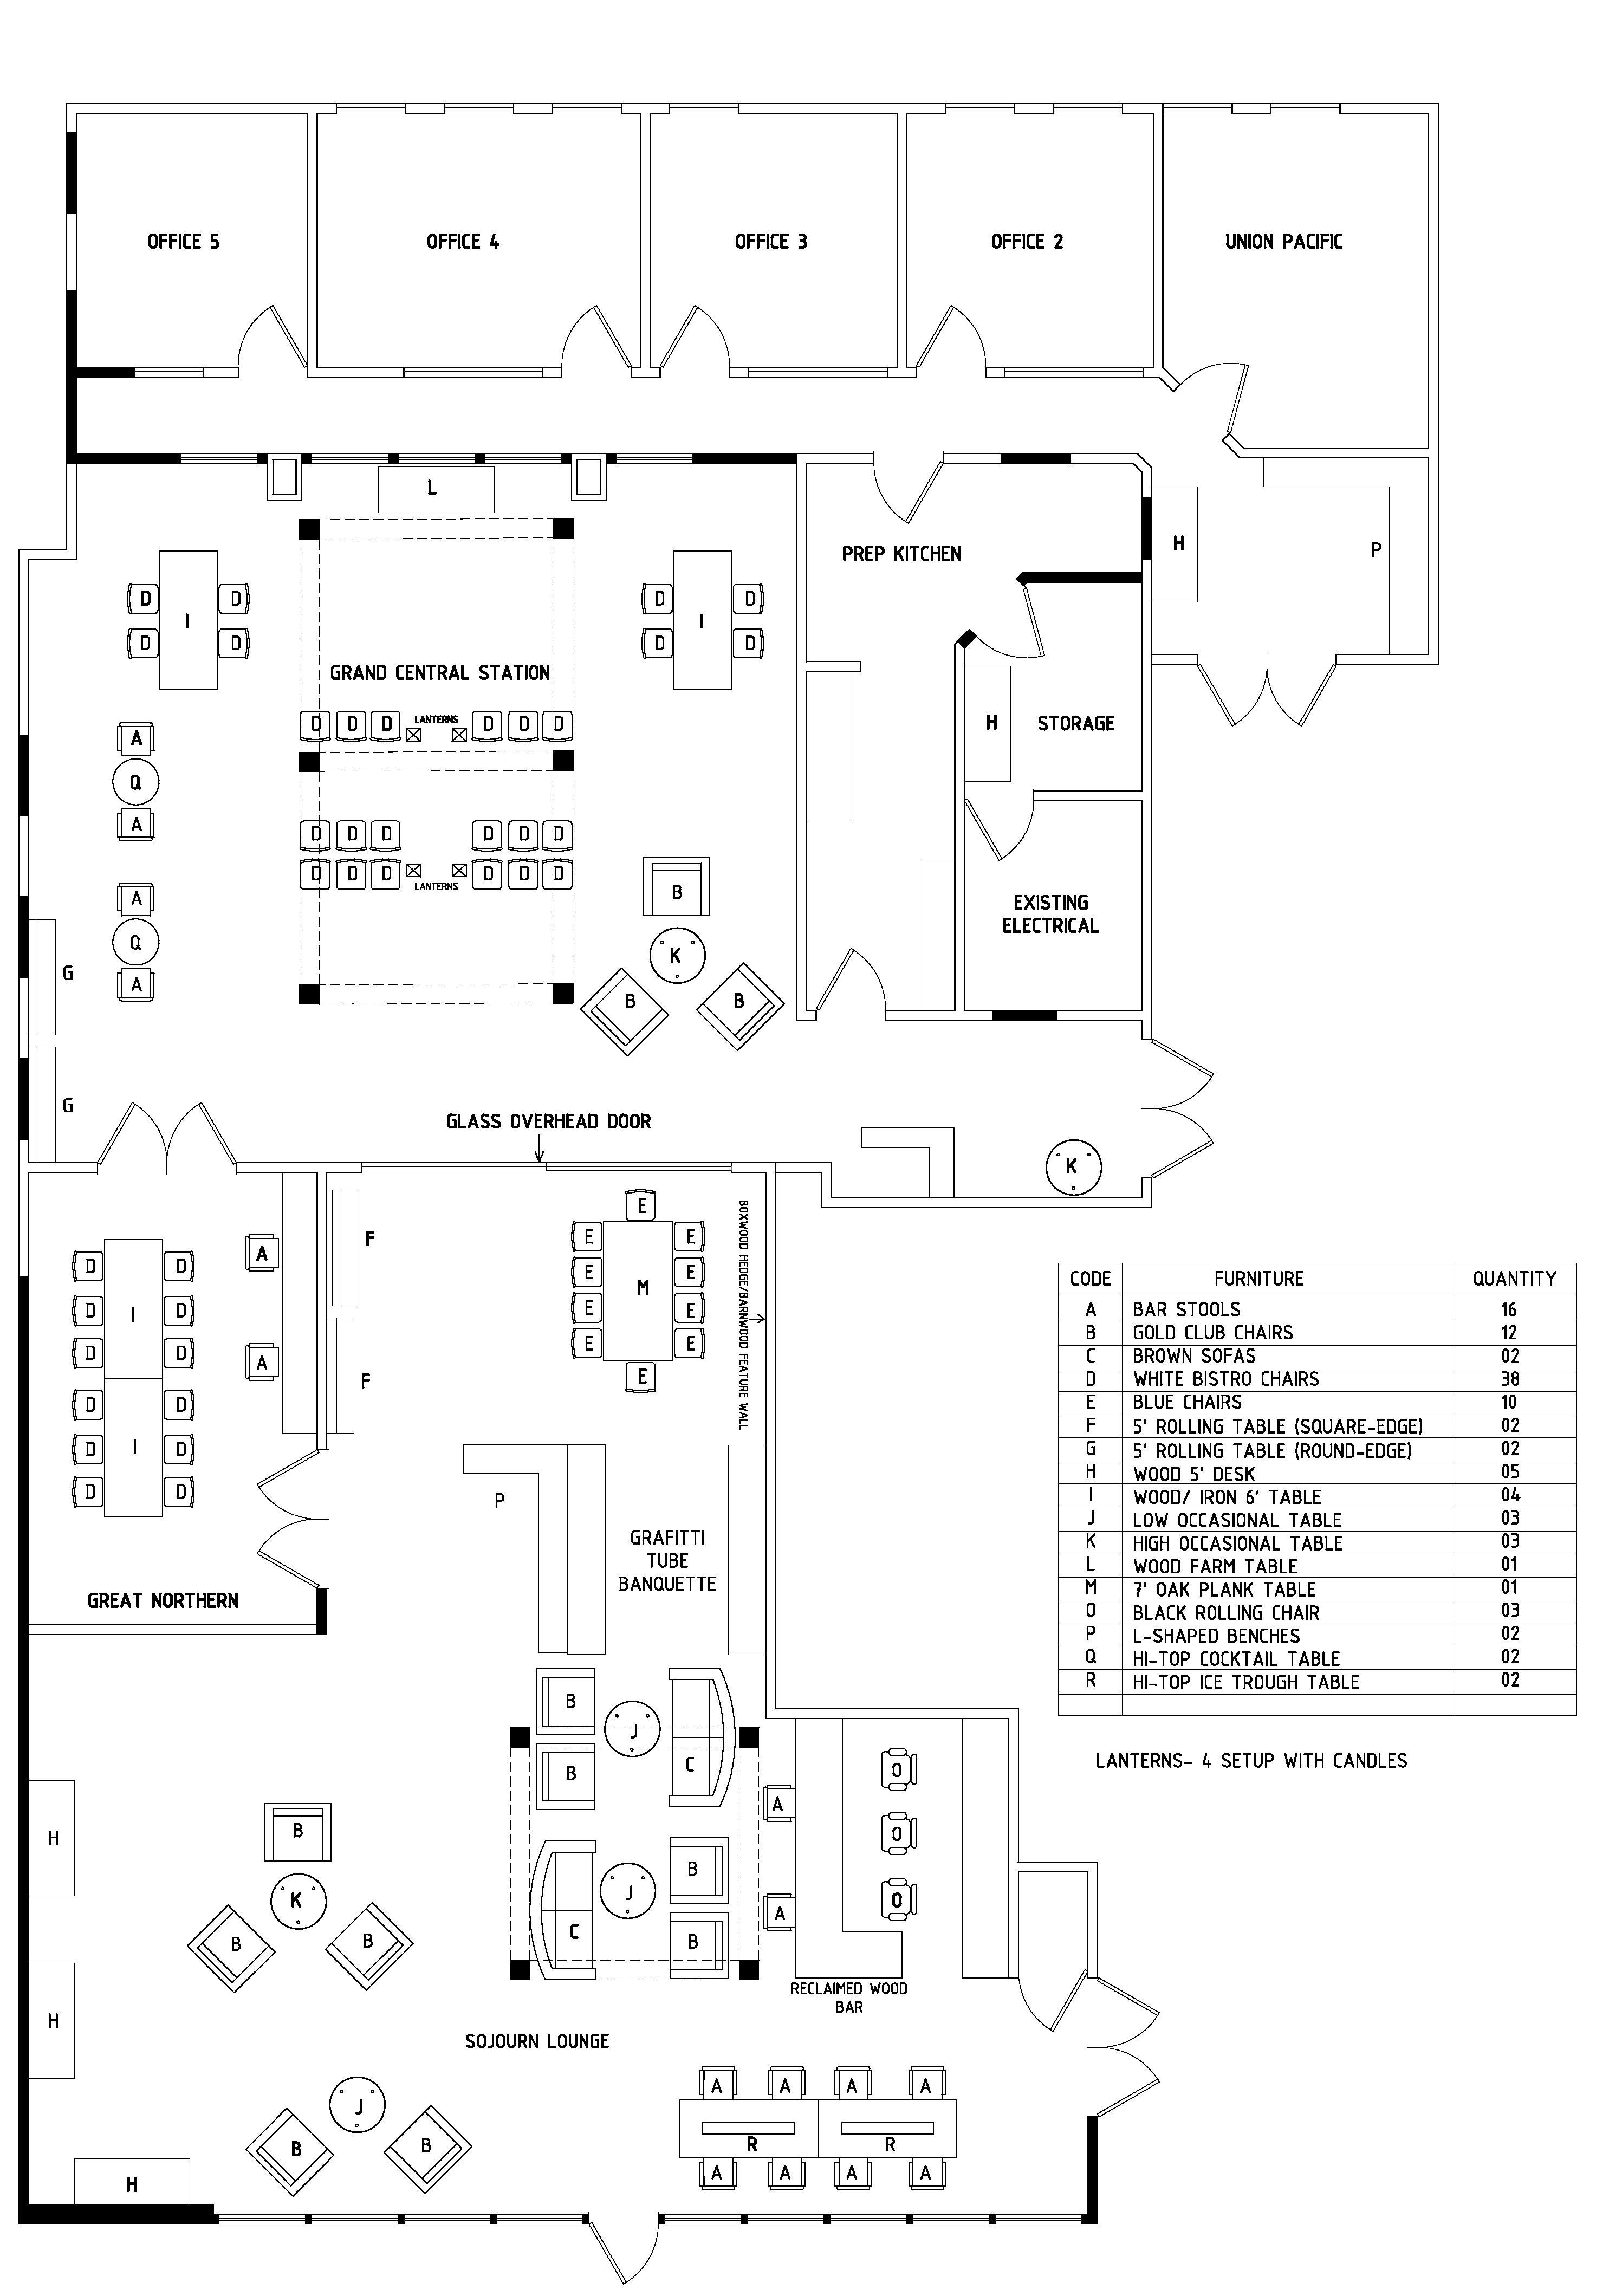 HUB 925 | An Urban Loft Venue